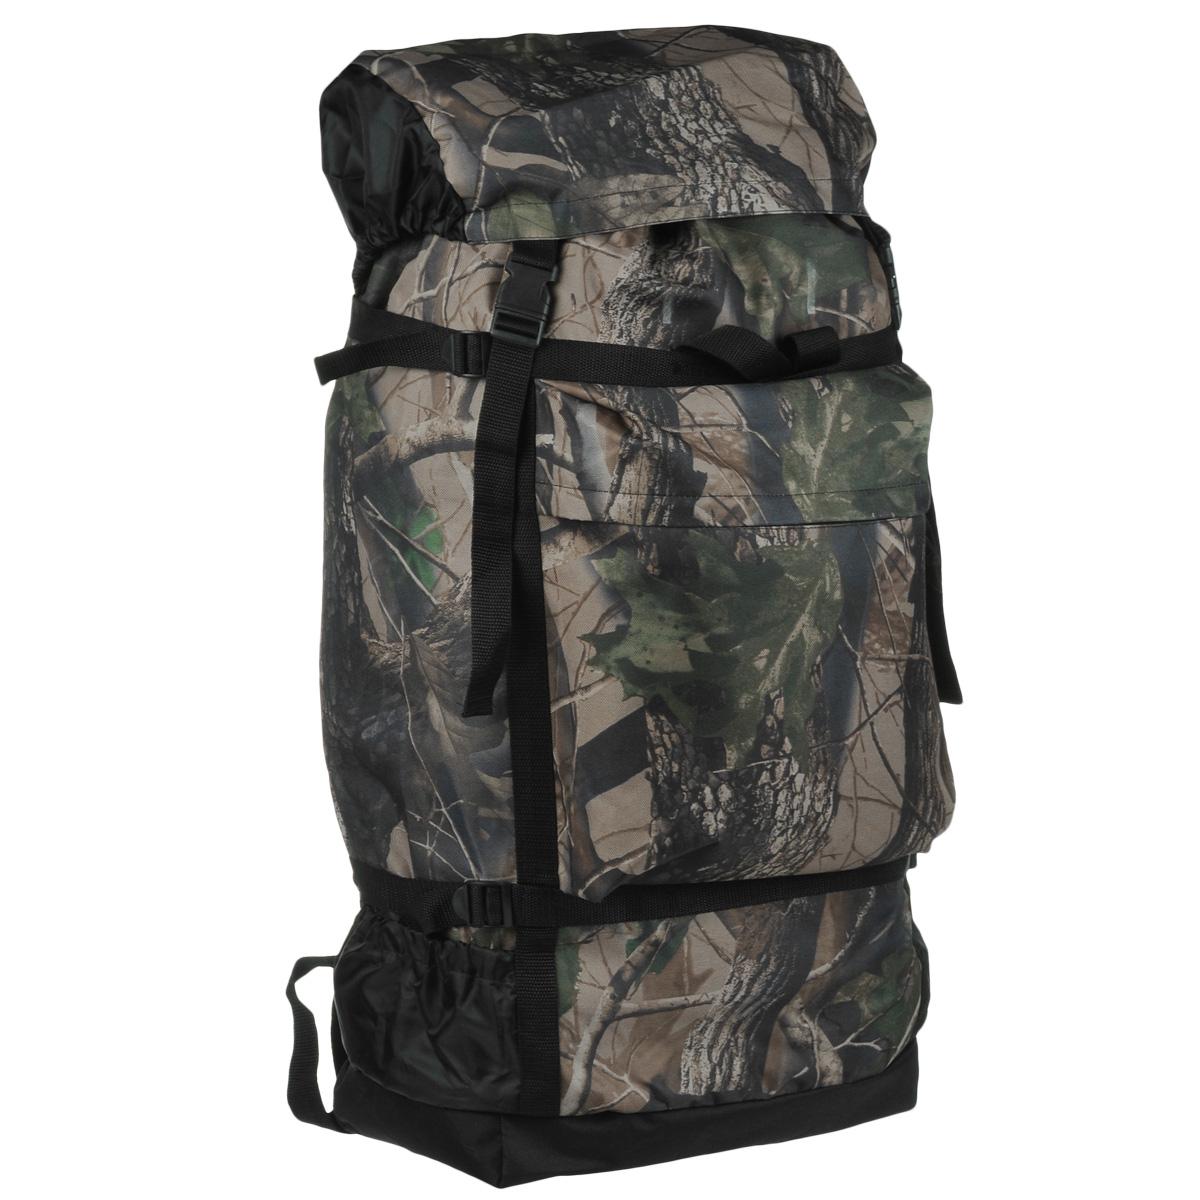 Рюкзак Huntsman Боровик, цвет: лес, 50 л